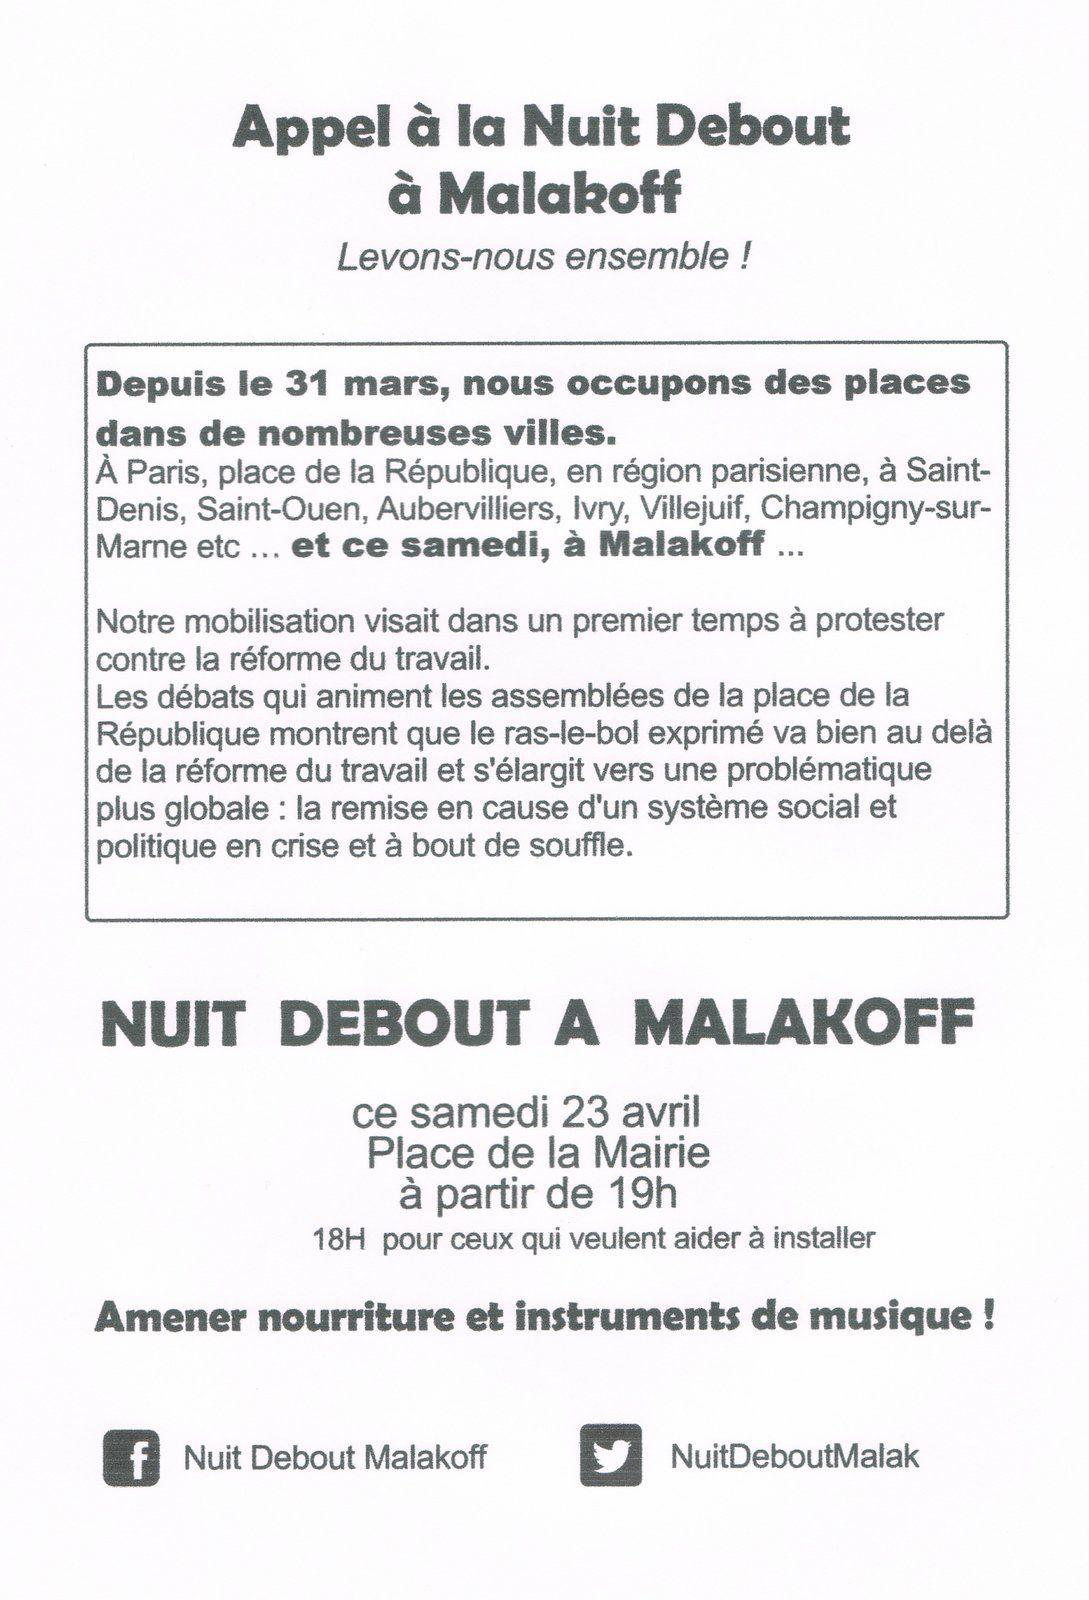 Malakoff: nuit debout demain